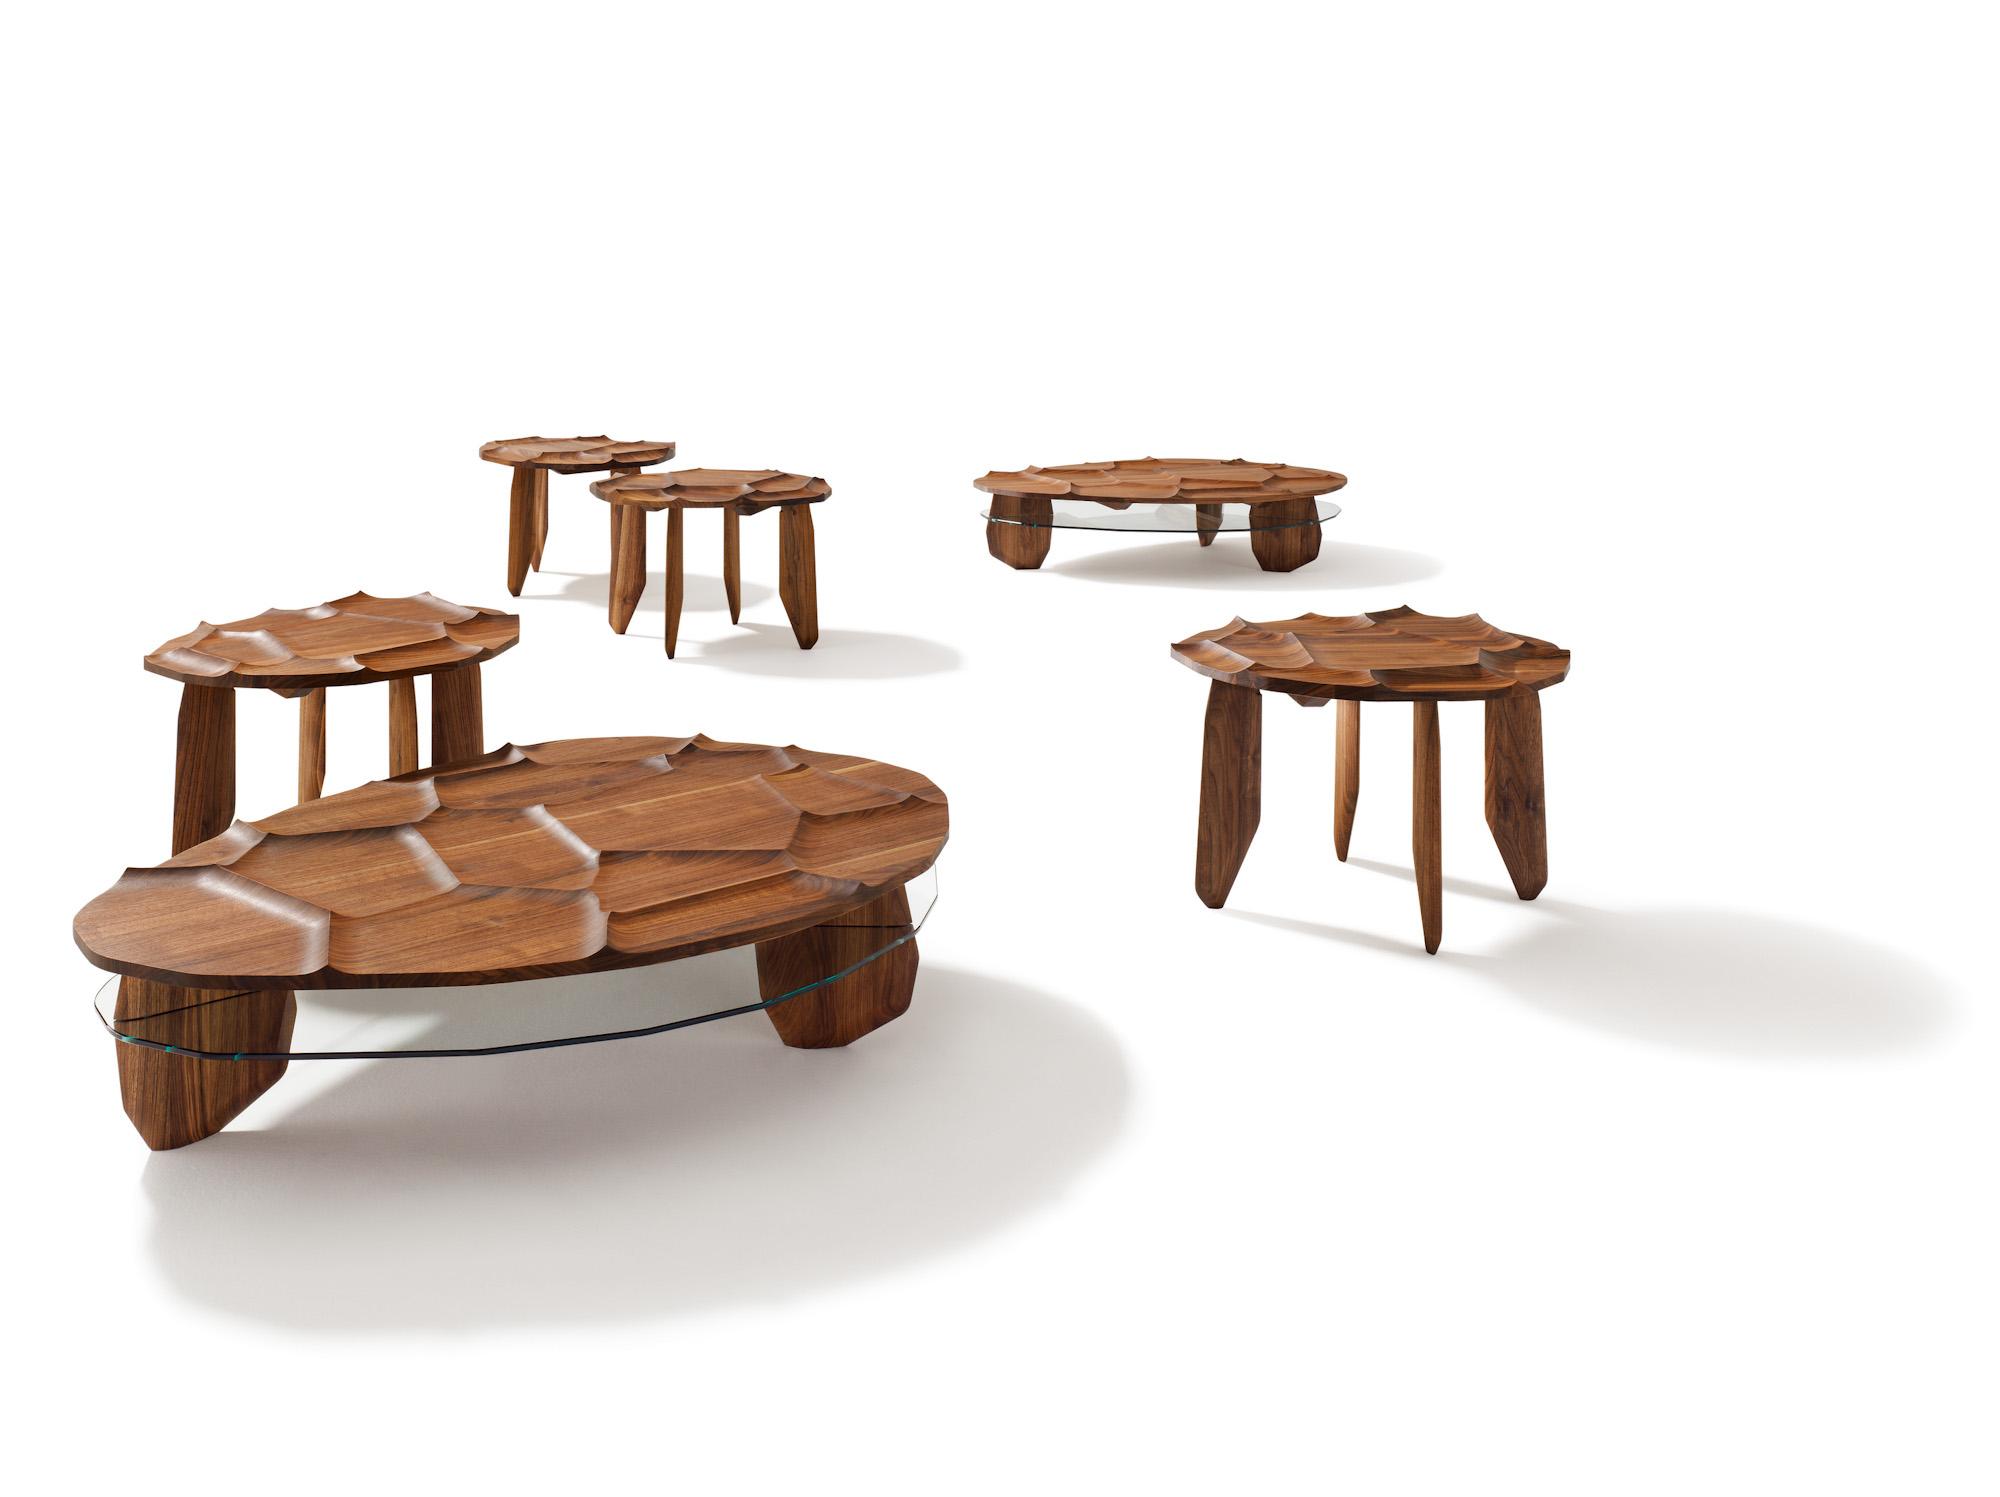 Wohnmöbel – Möbel Morschett